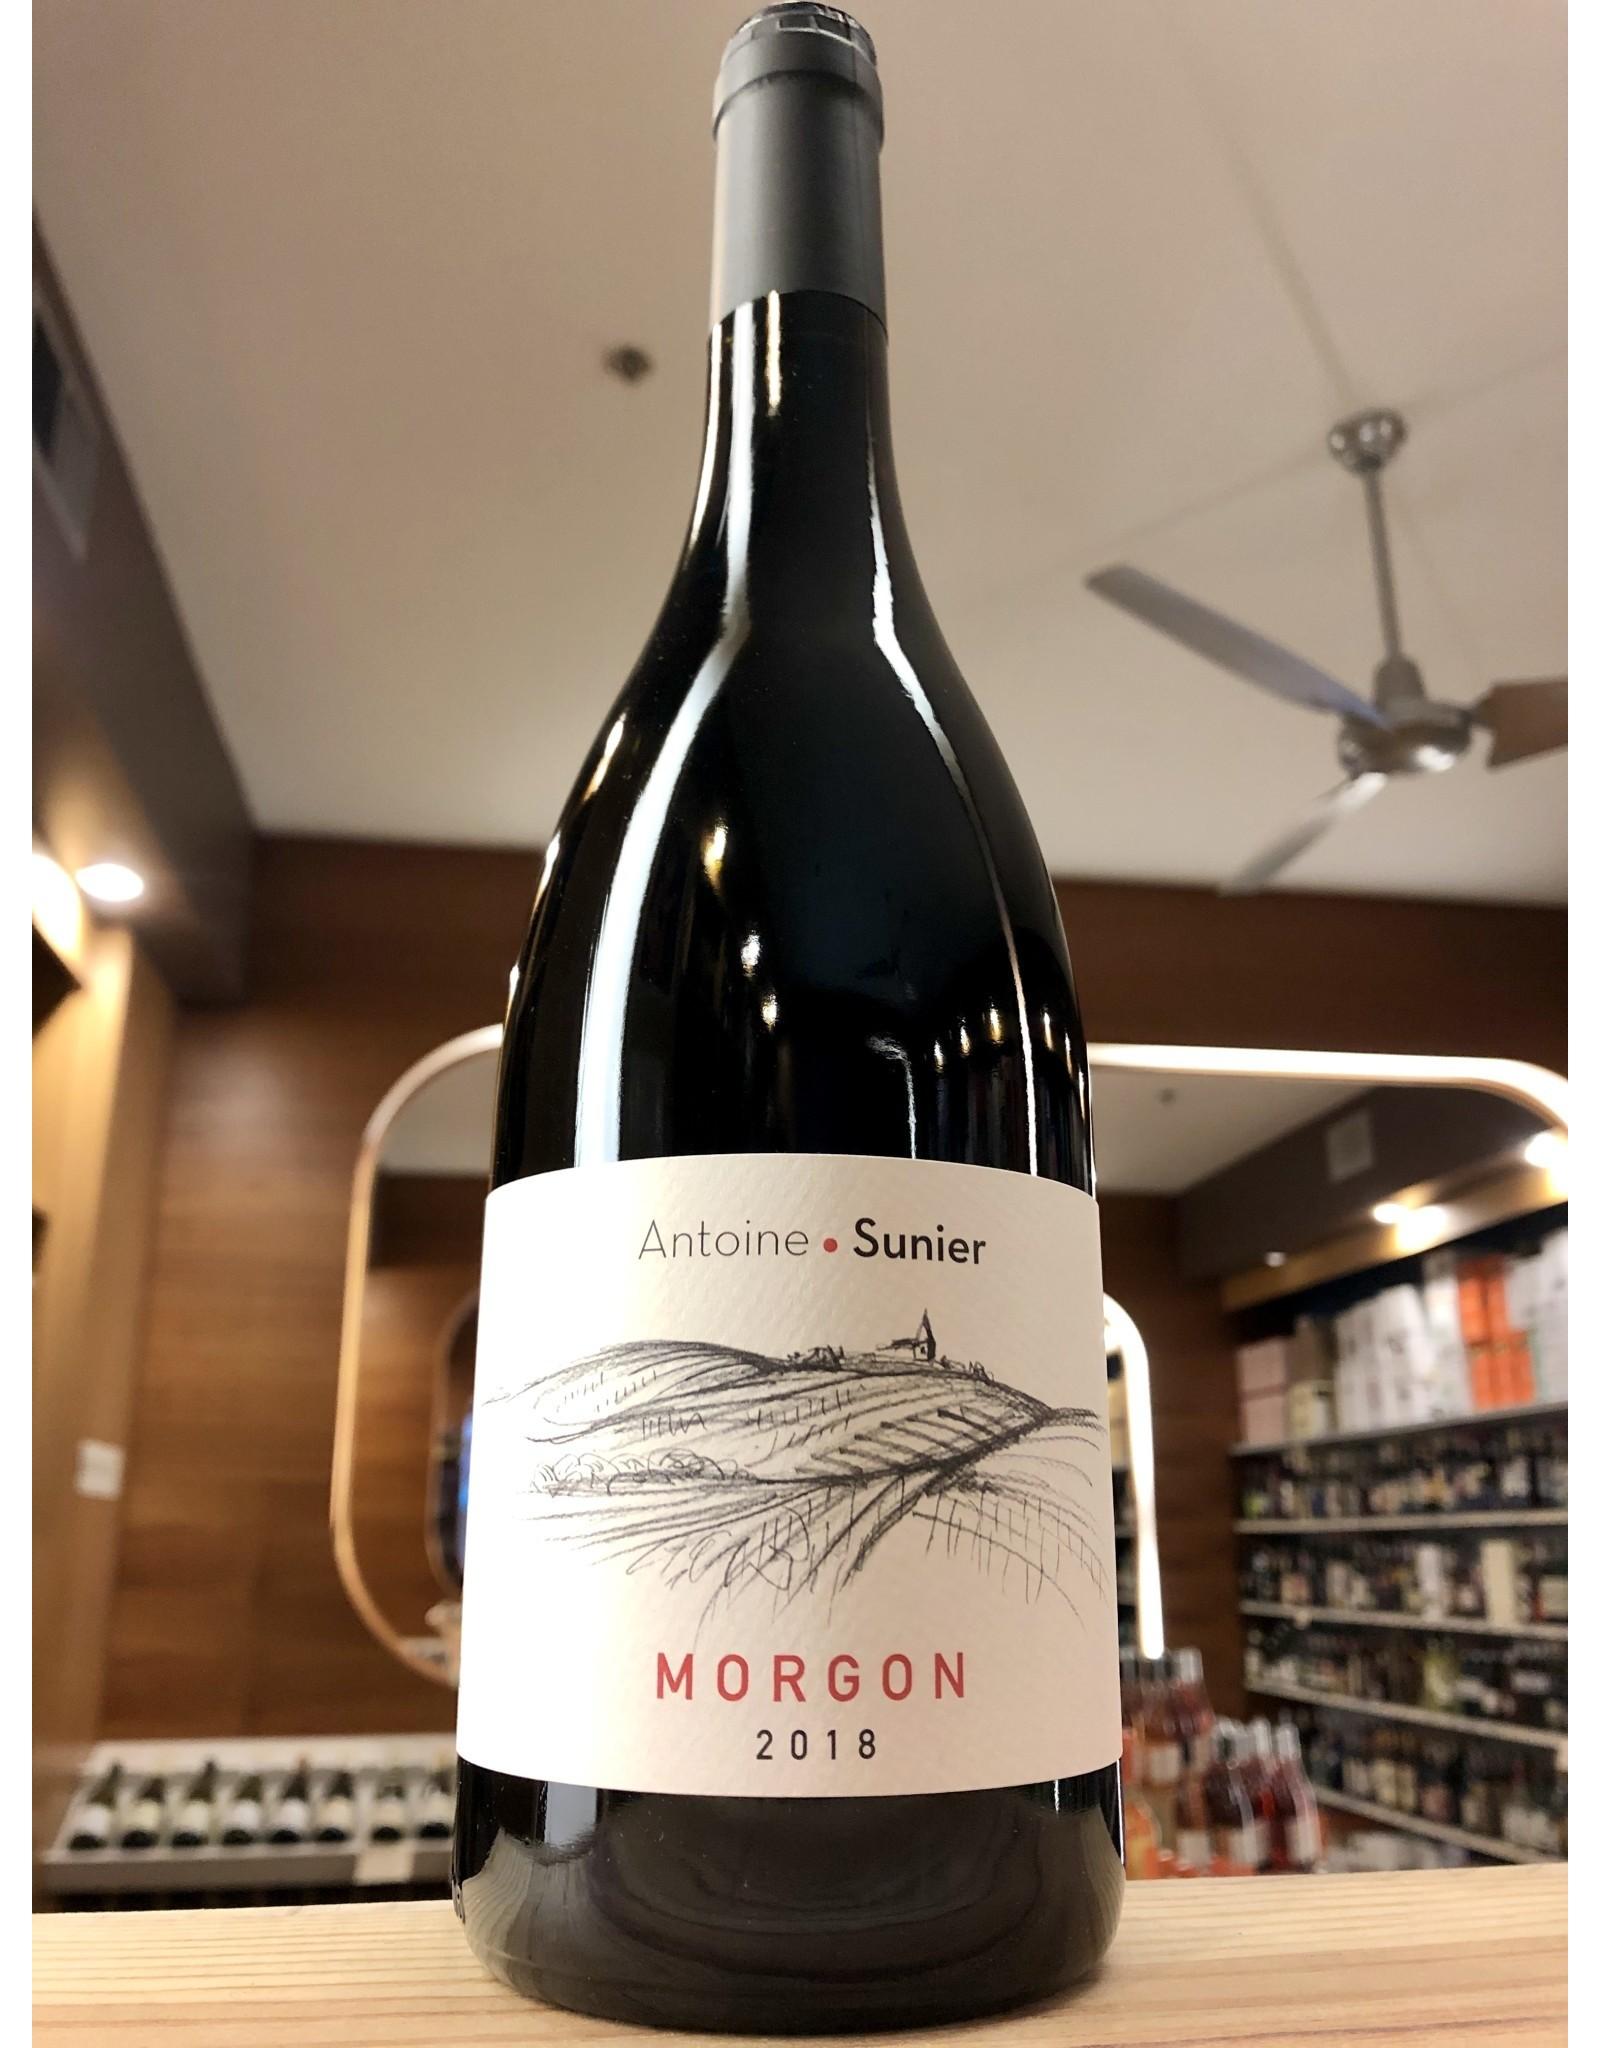 Antoine Sunier Morgon 2019 - 750 ML